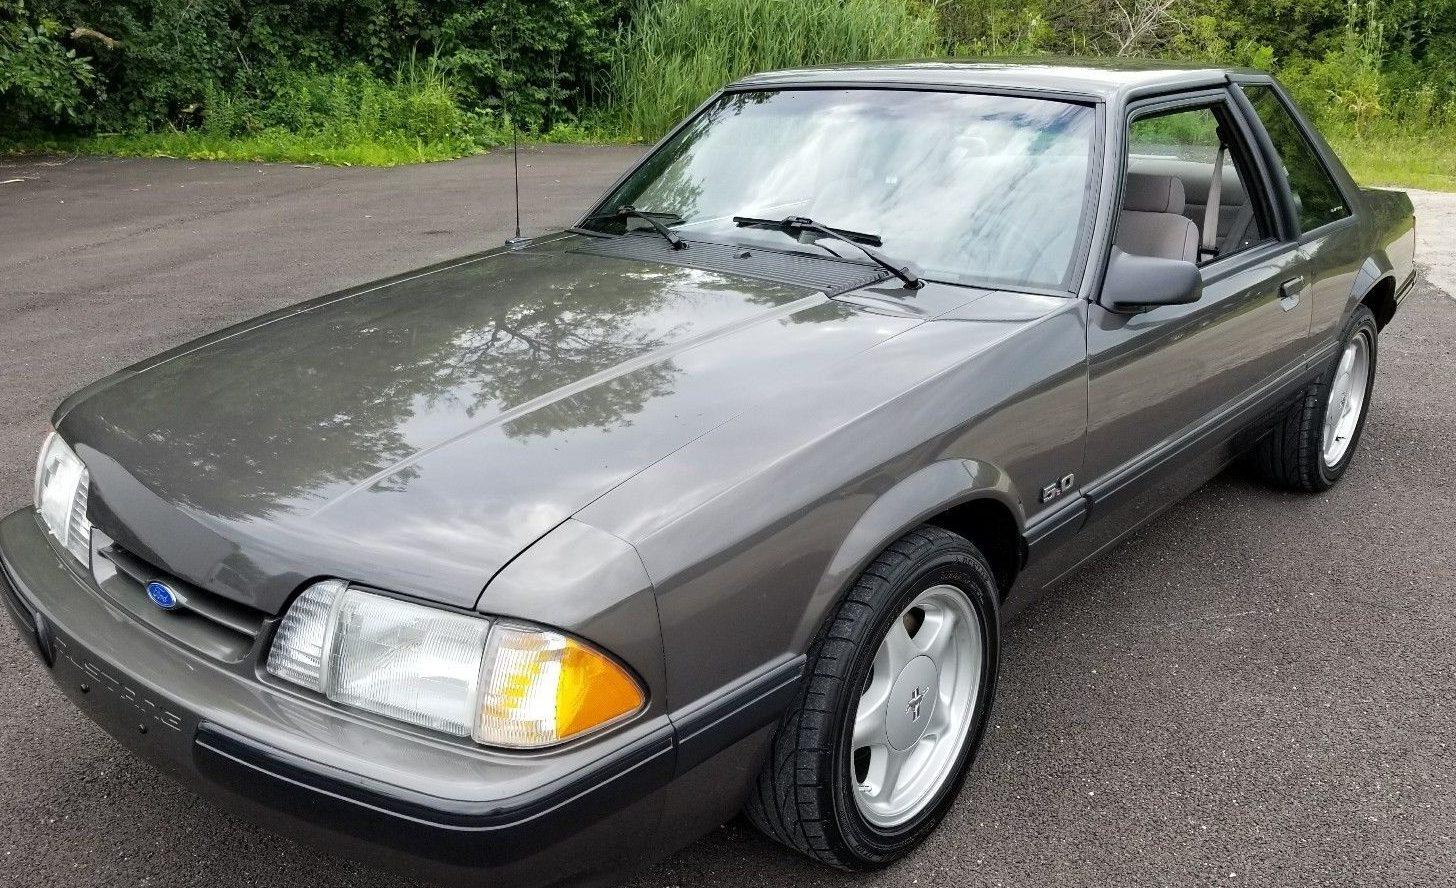 Fox Body Mustang >> Pony Car Unicorn: 1990 Mustang Notchback 5.0